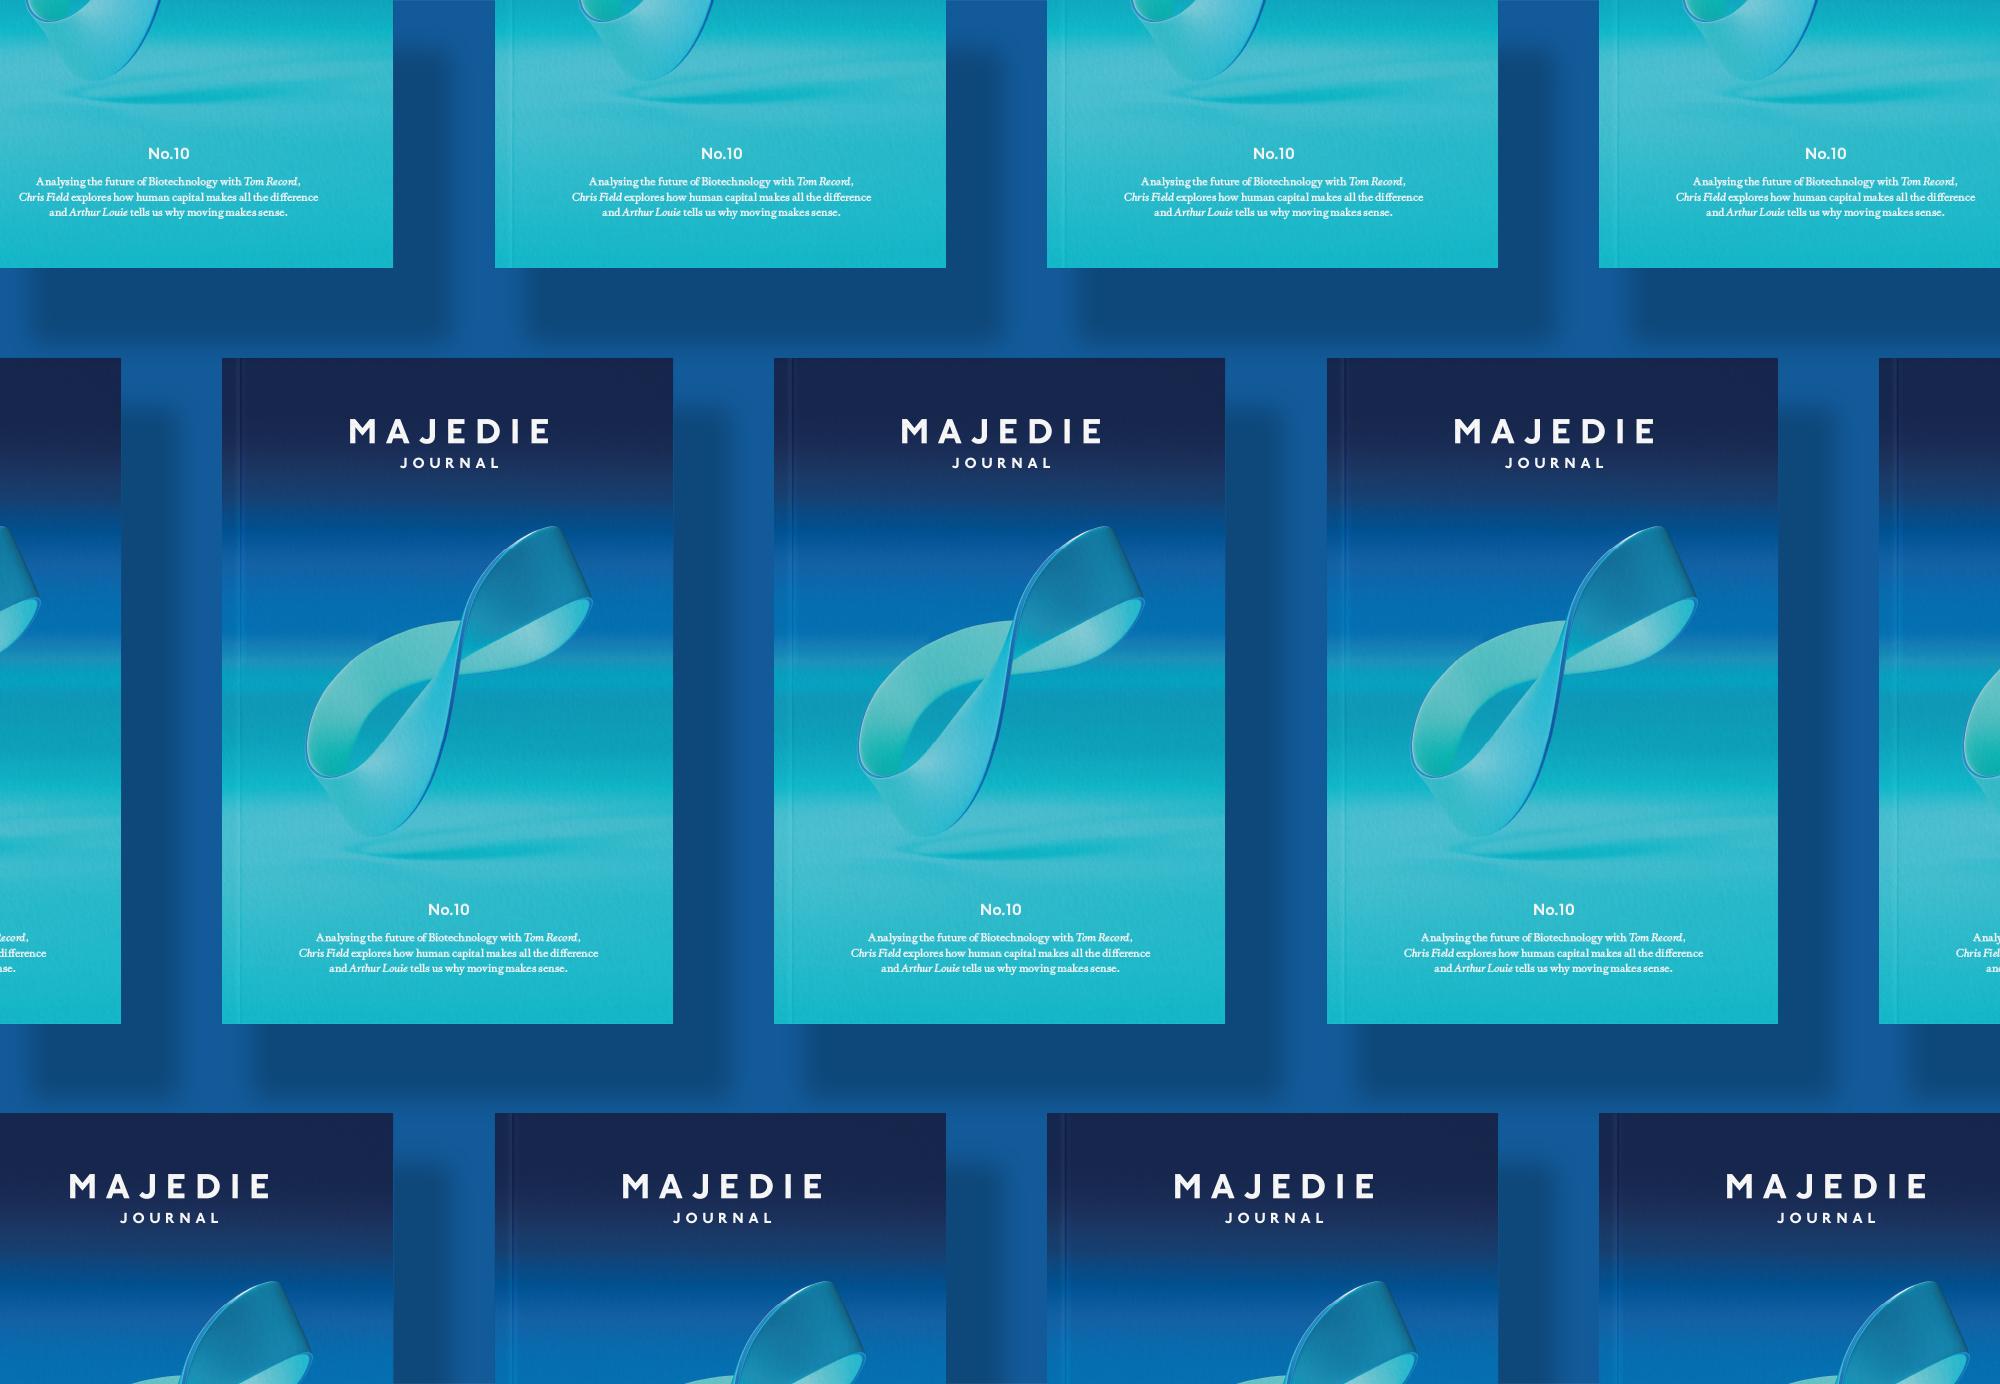 Majedie Journal No.10